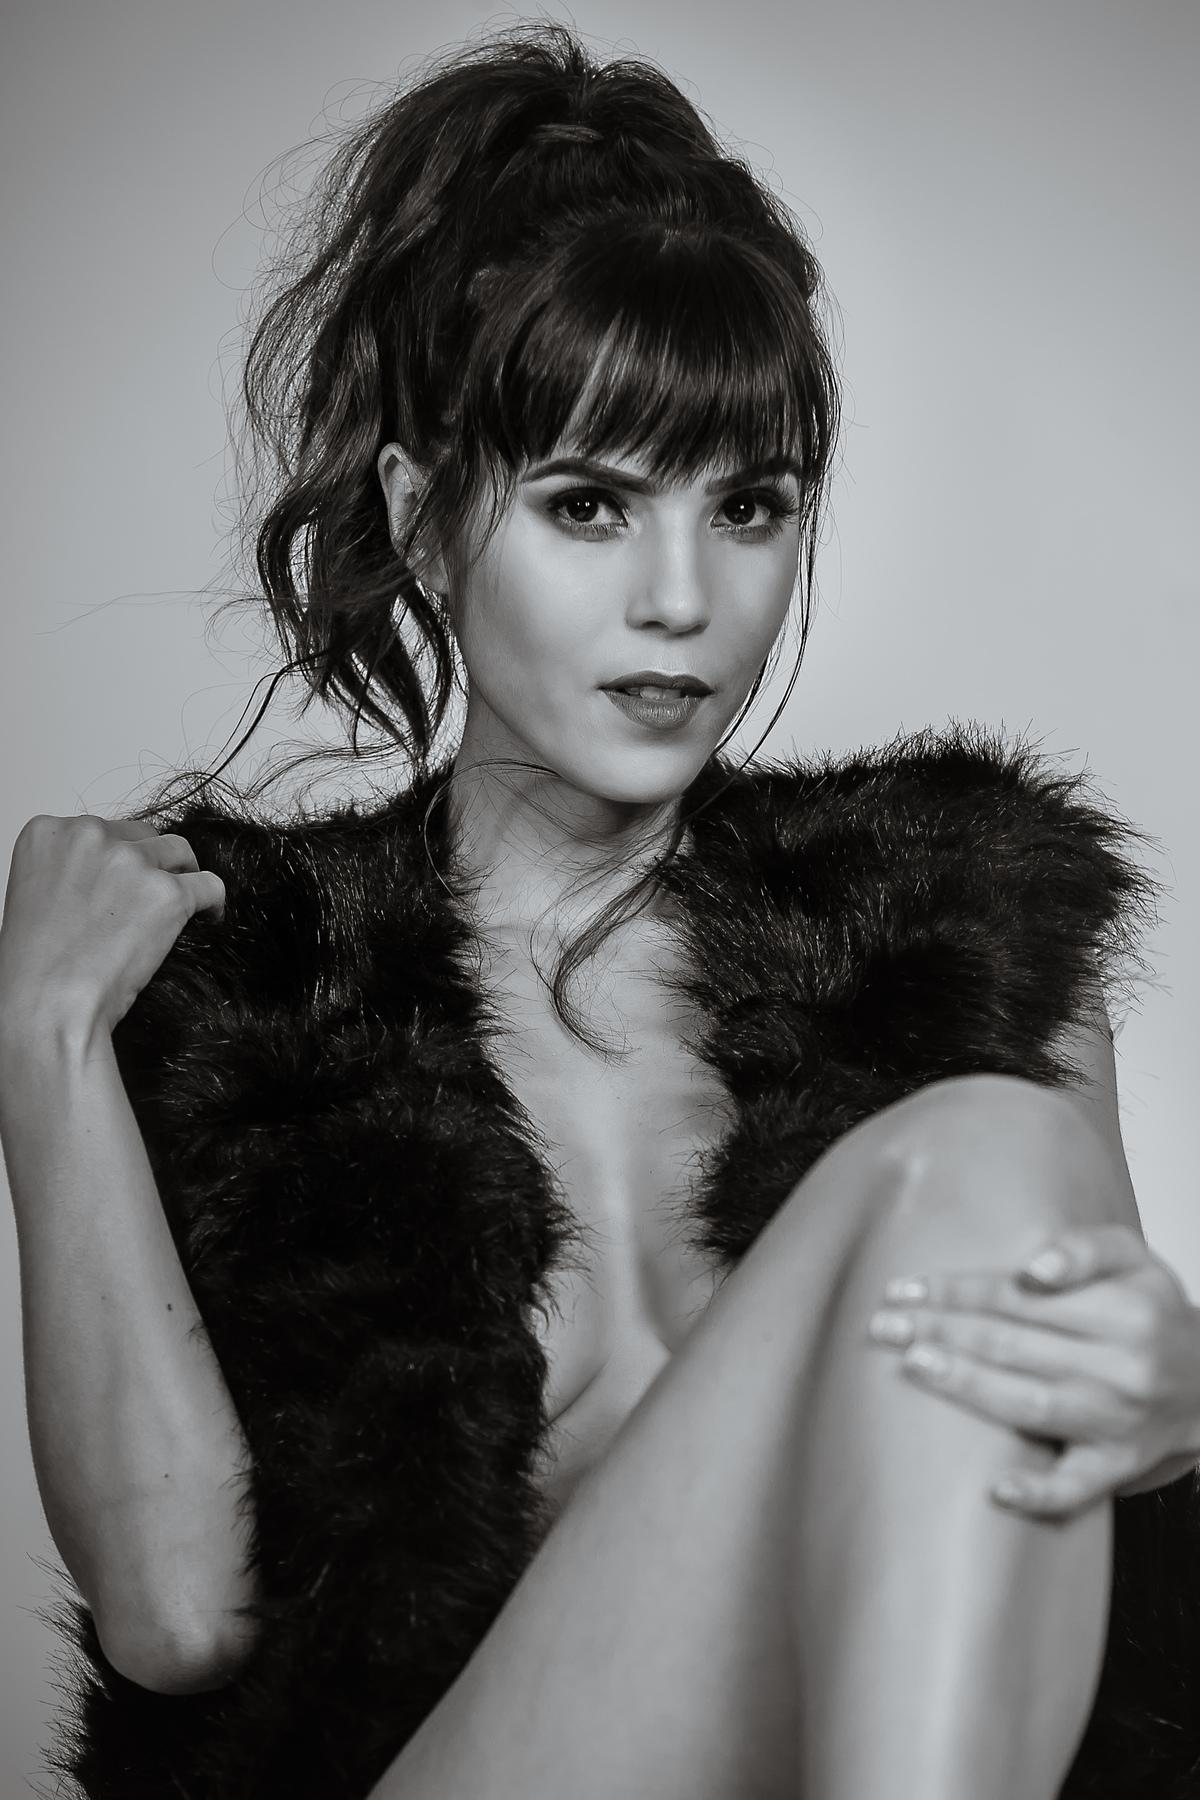 Brinna Kelly